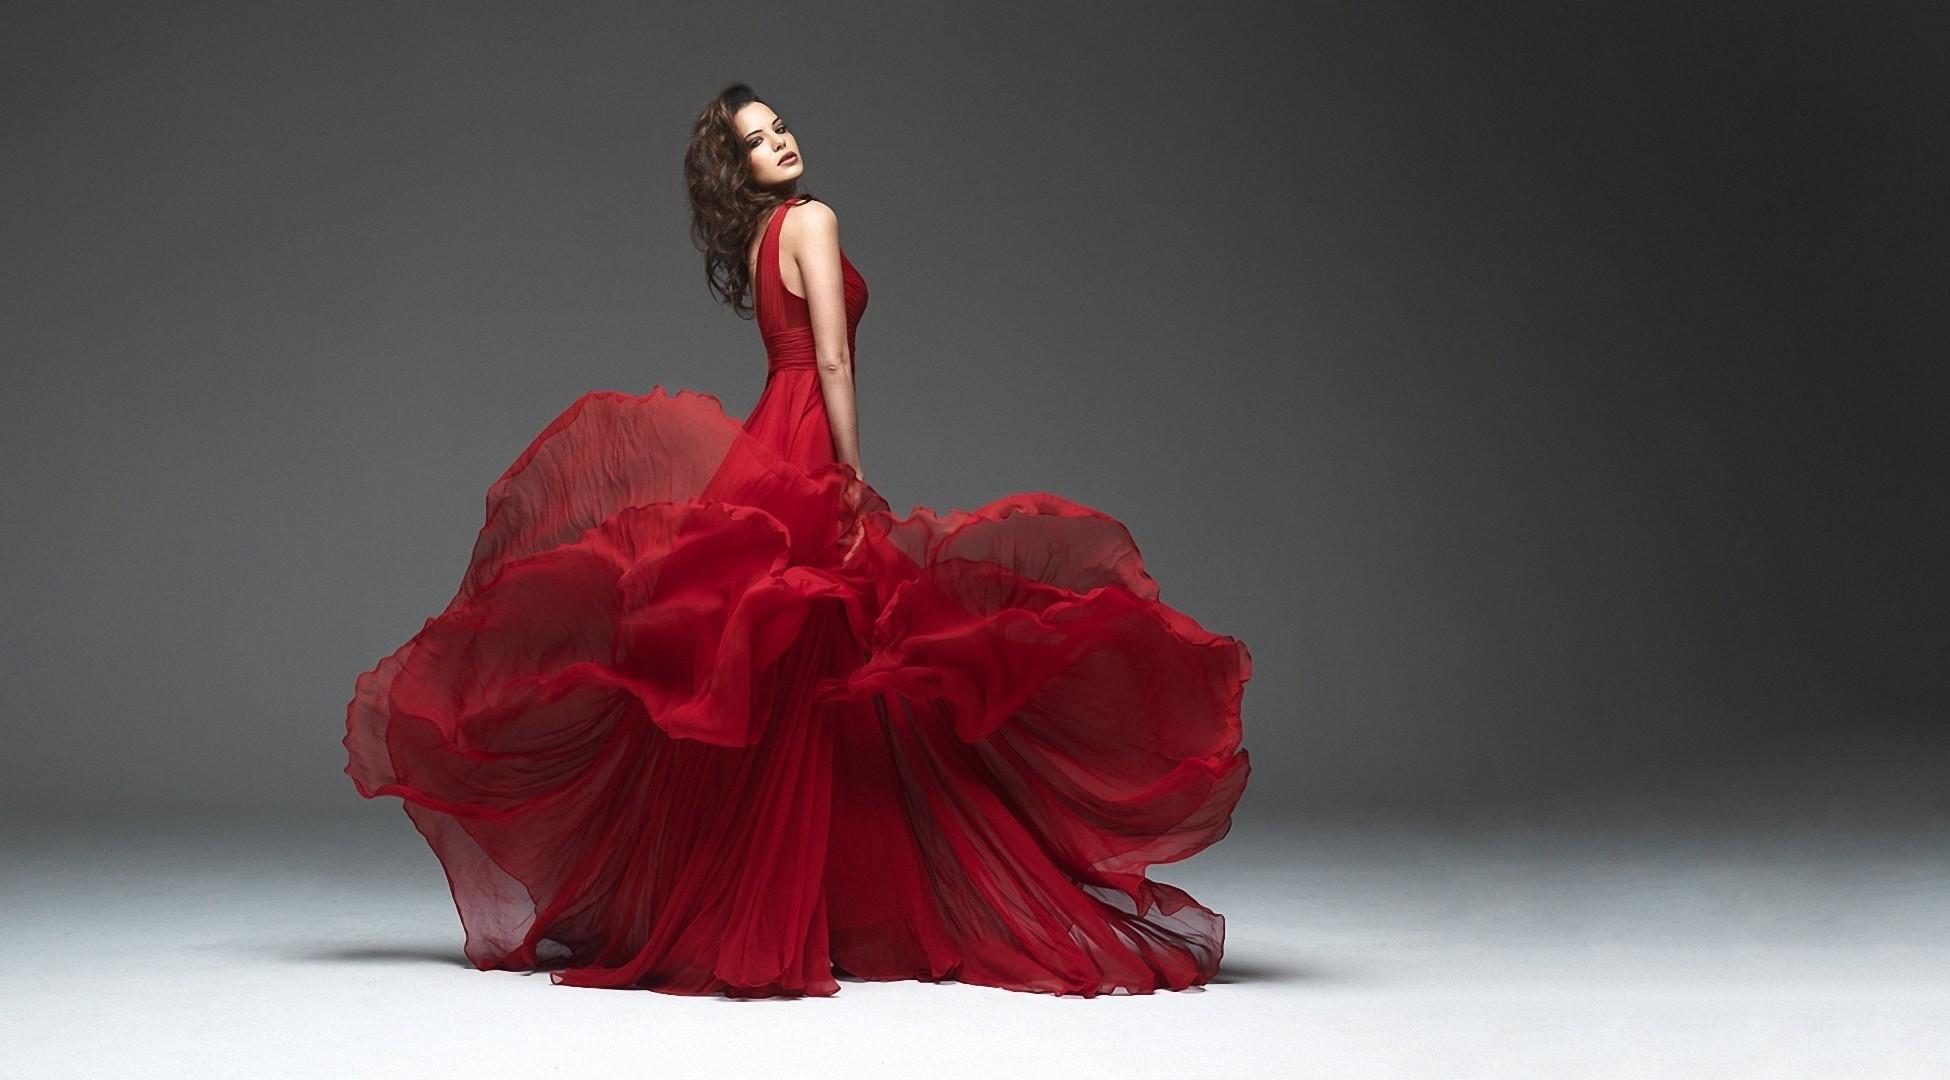 asombroso mujer baile